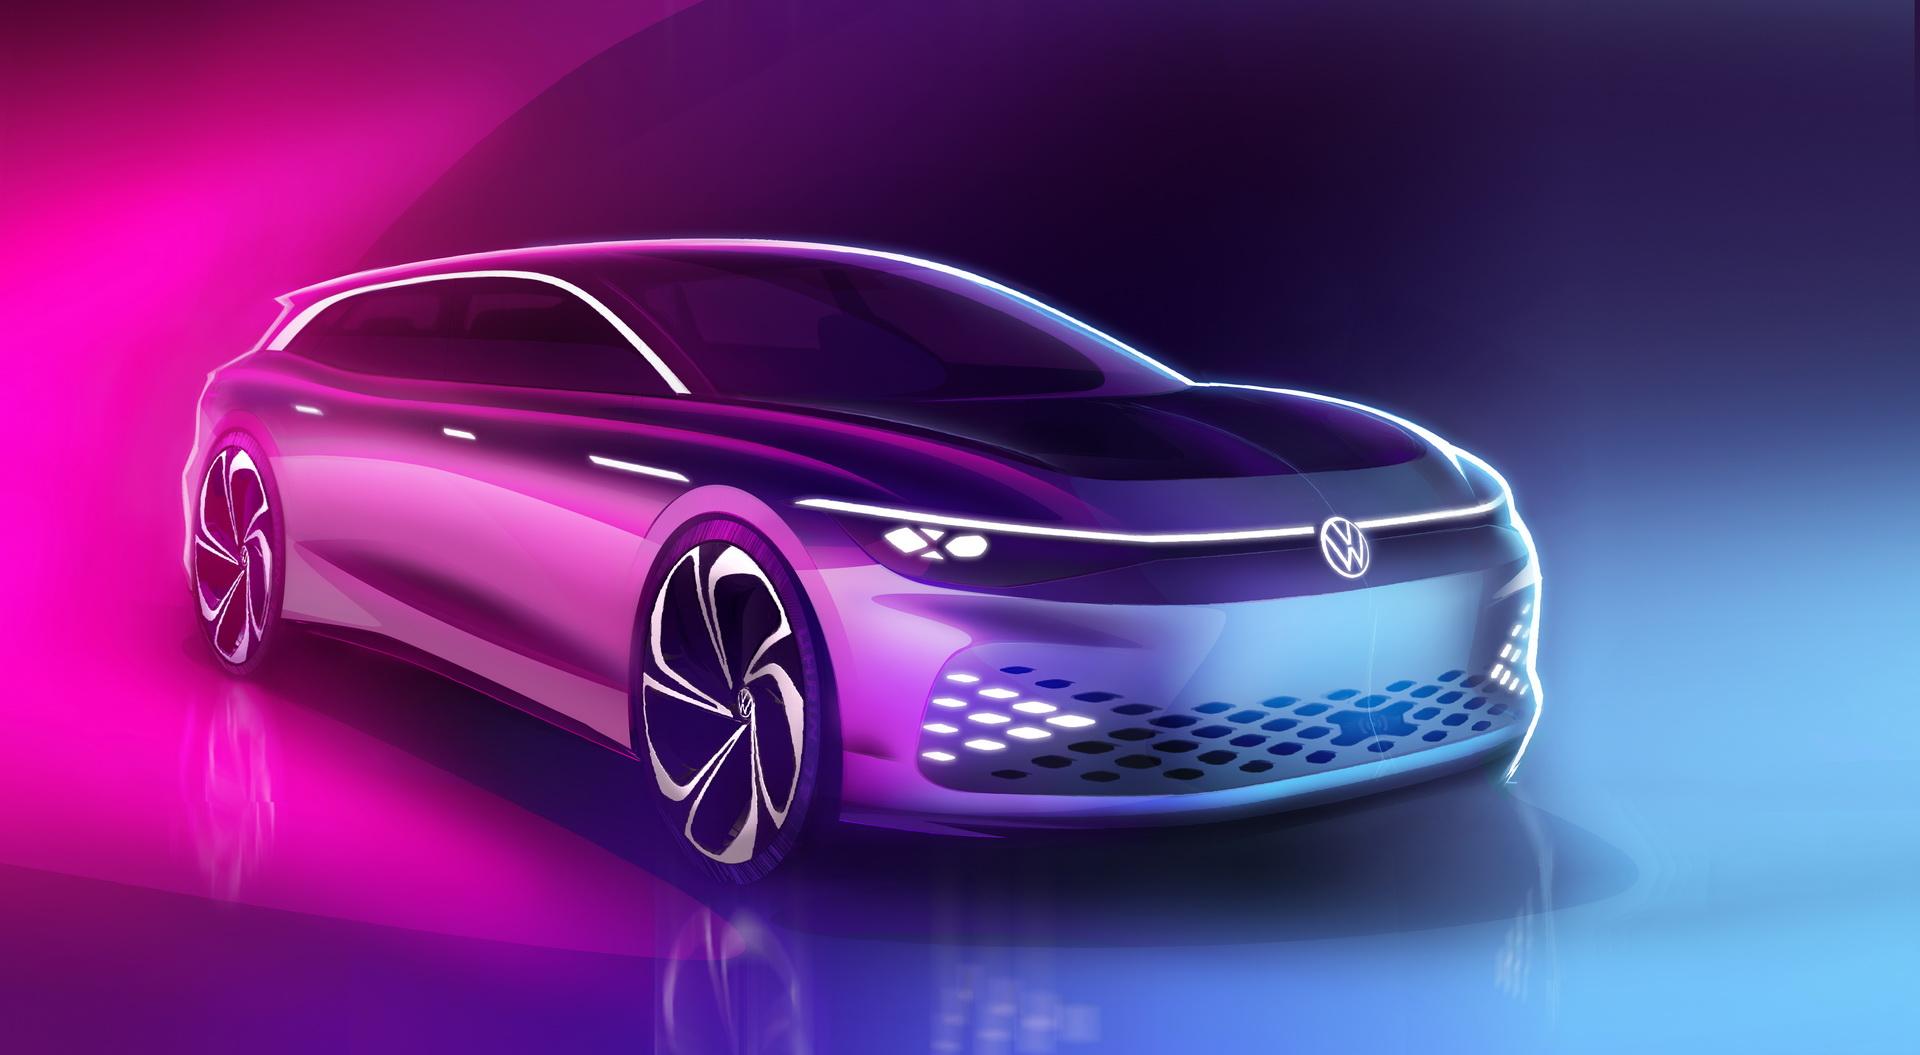 VW-ID-SPACE-VIZZION-CONCEPT-01.jpg